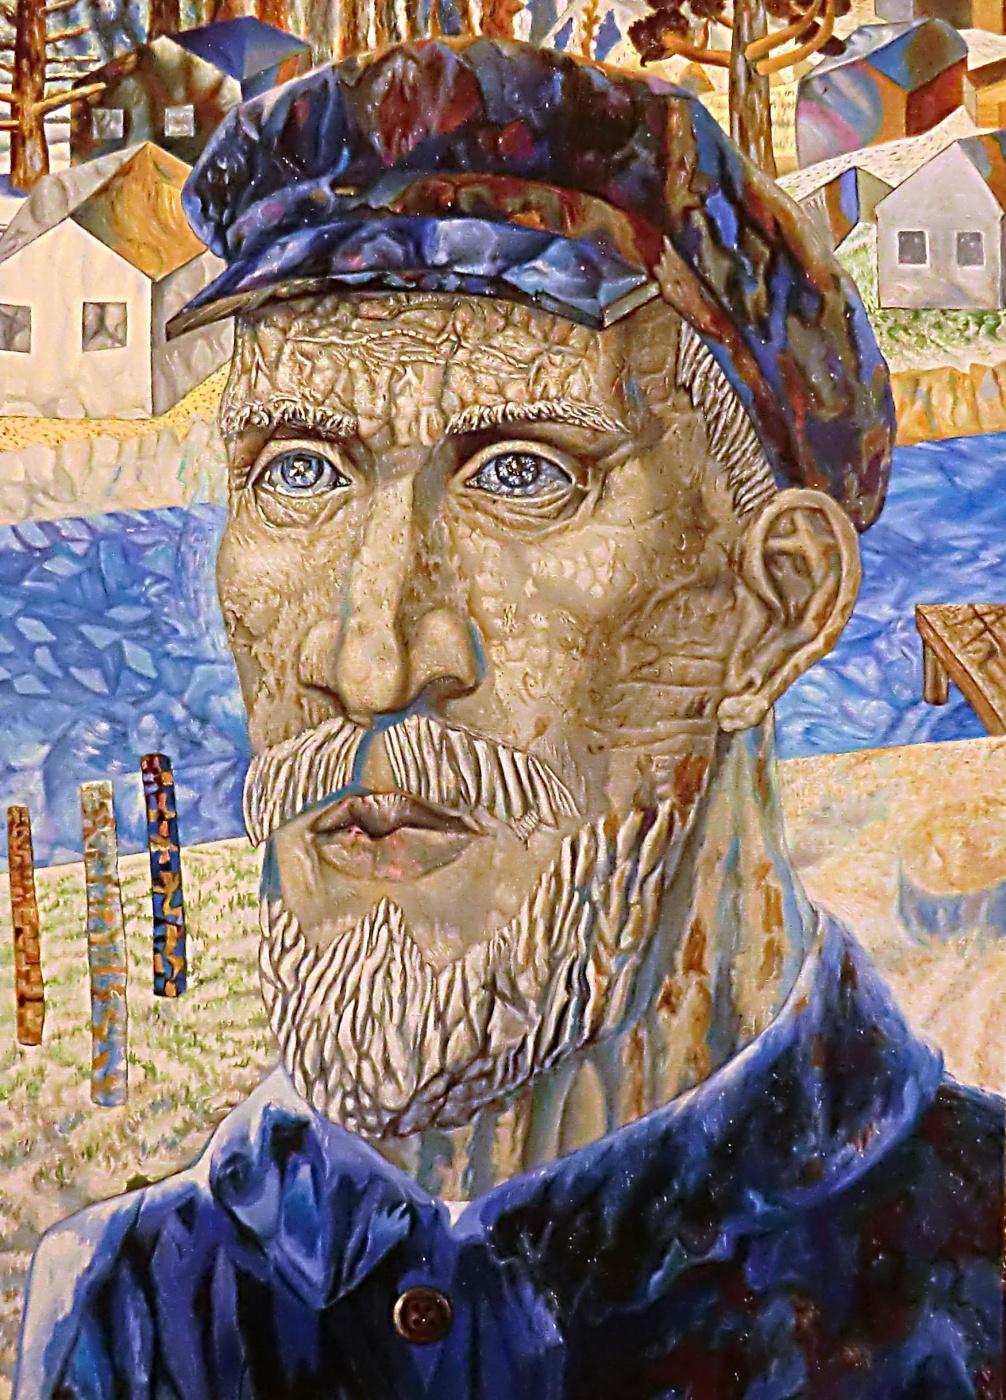 Valery Vasilyevich Litvinov. Collective farmer (copy from Filonov)